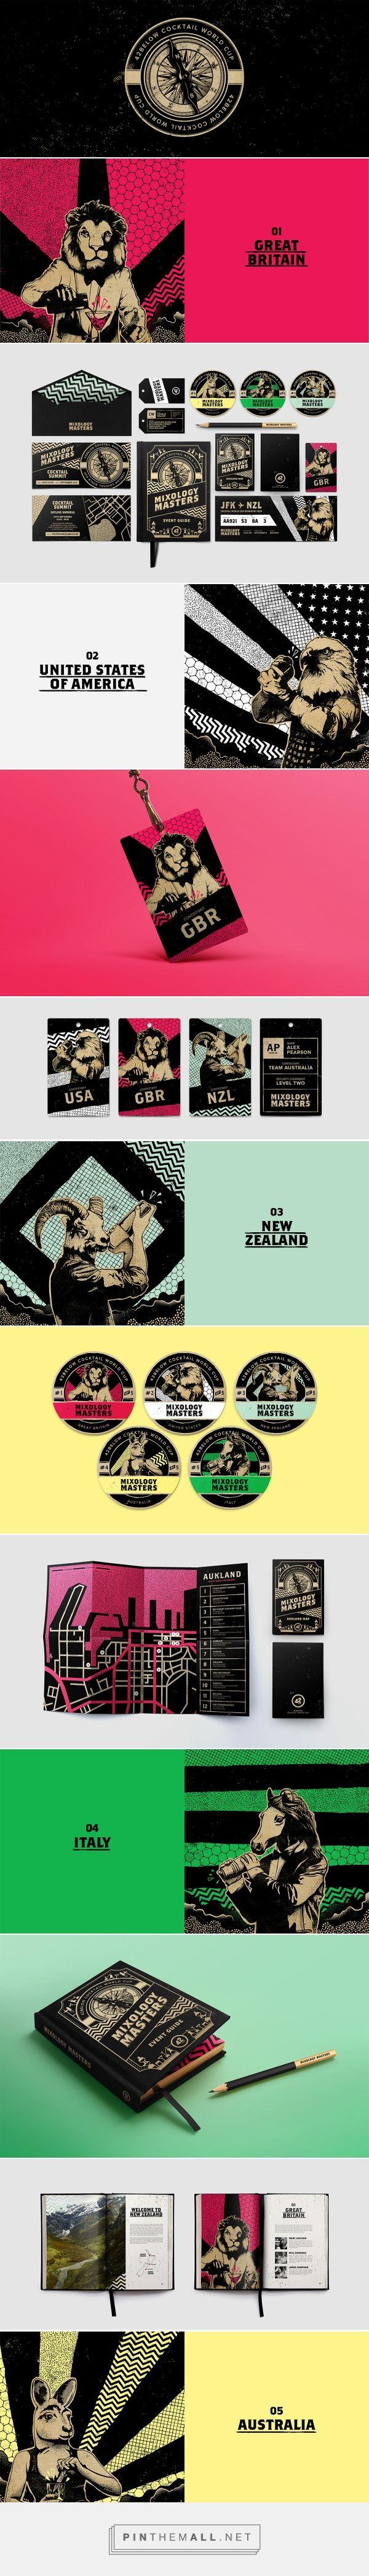 Cocktail World Cup Event Branding by TJ Nicklin   Fivestar Branding – Design and Branding Agency & Inspiration Gallery